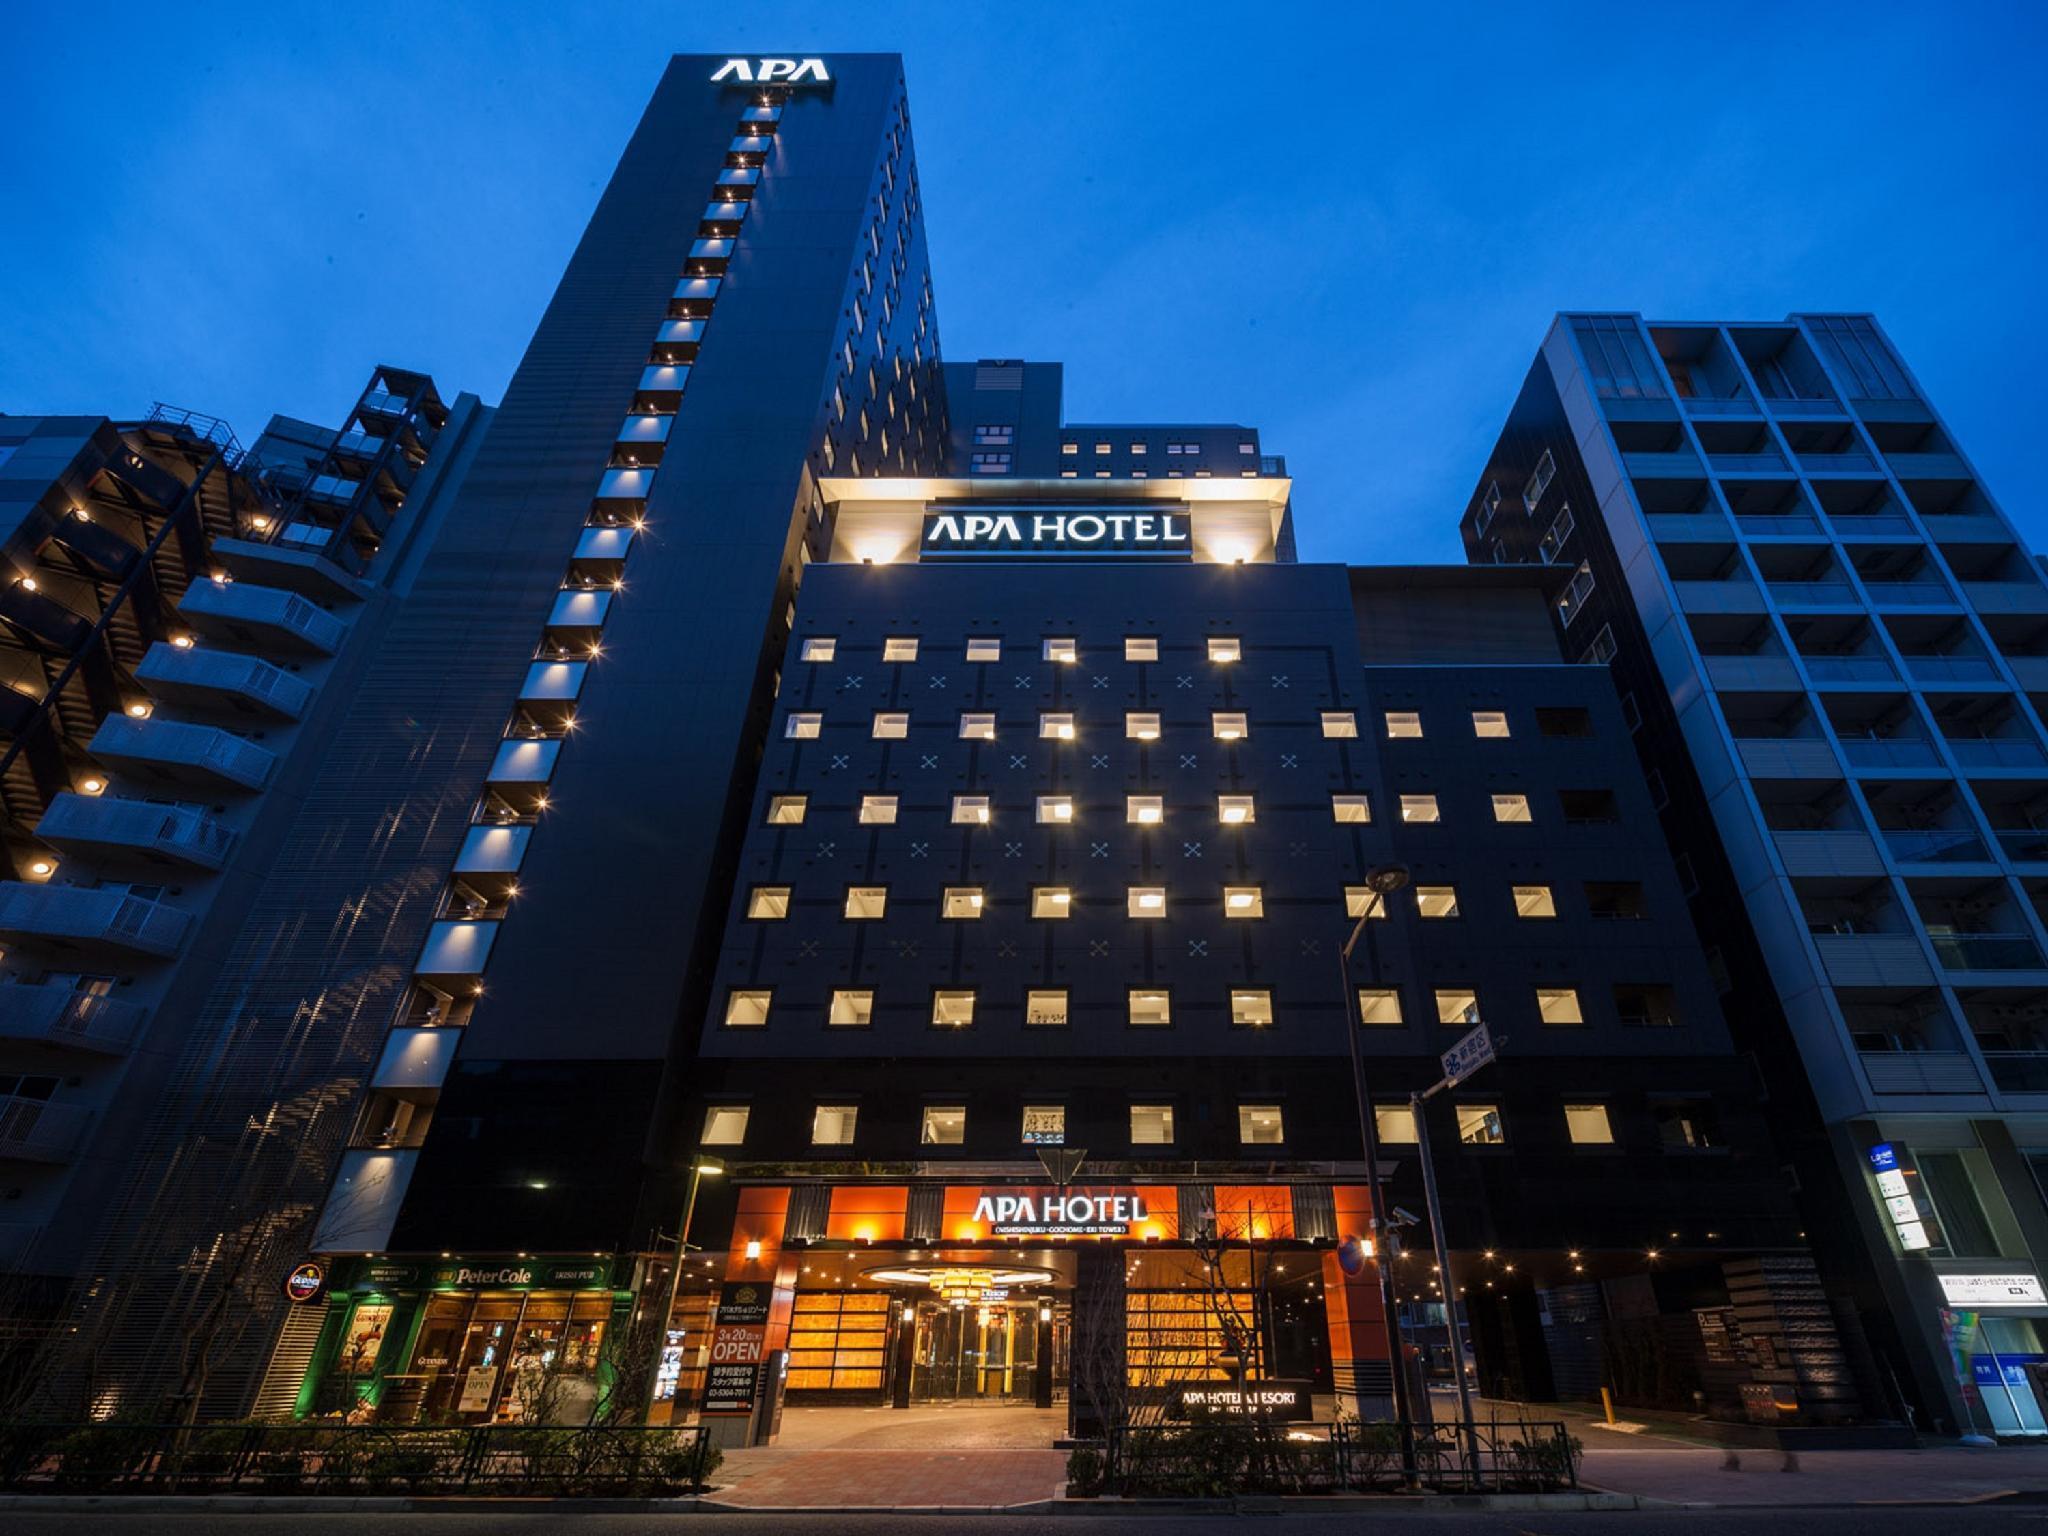 APA度假酒店 - 西新宿五丁目站大廈 APA Hotel  Resort Nishishinjuku Gochome Eki Tower